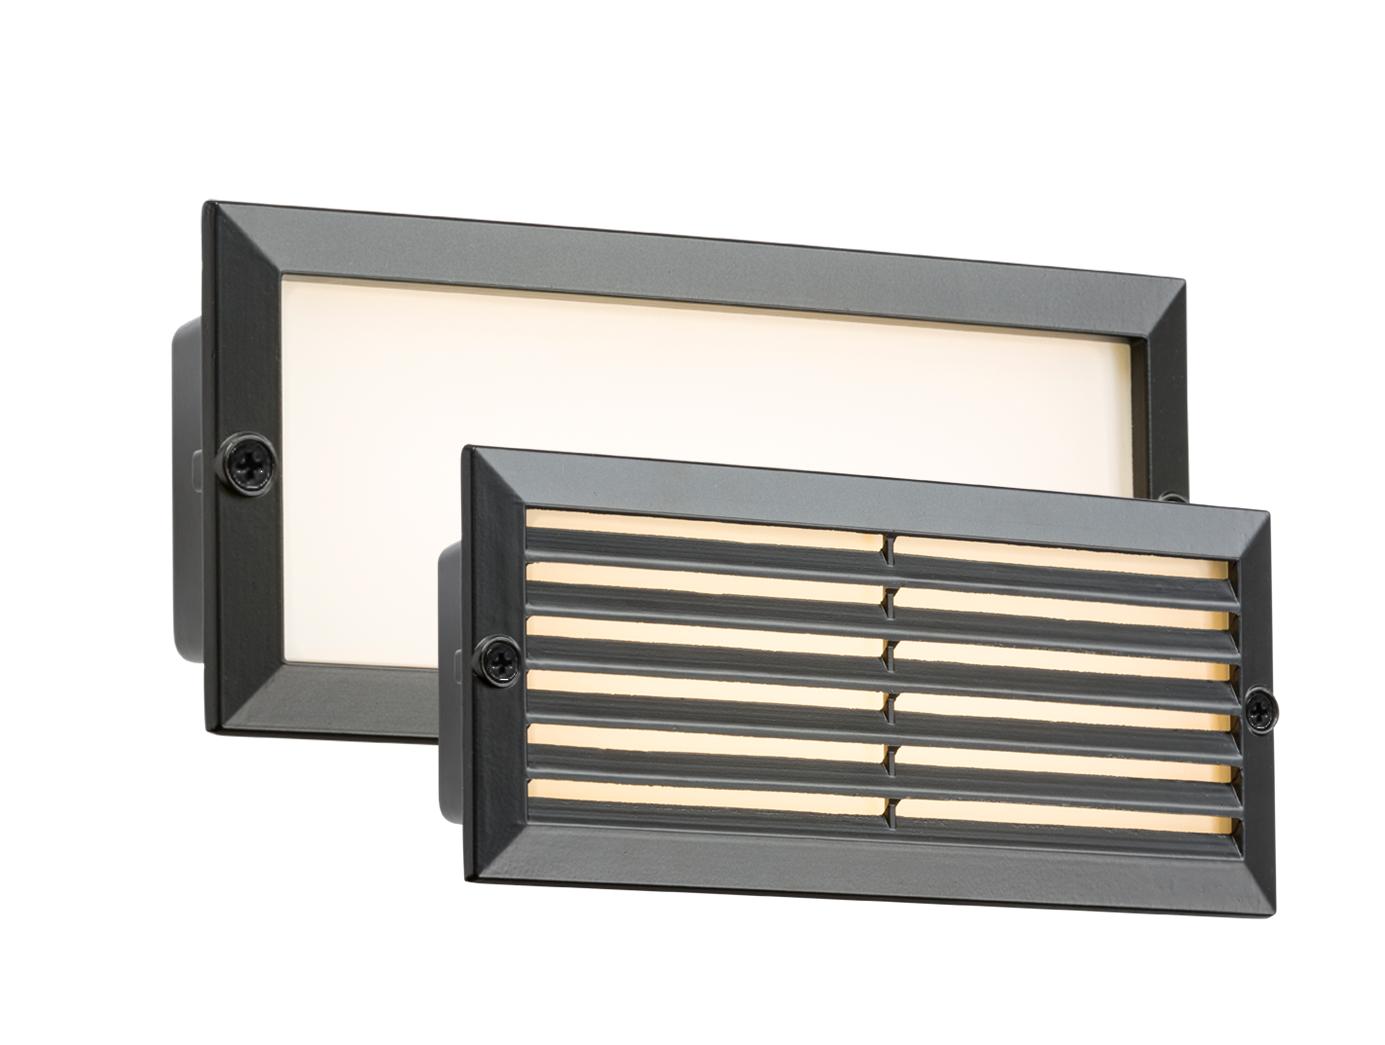 230V IP54 5W WHITE LED BRICK LIGHT - BLACK FASCIA